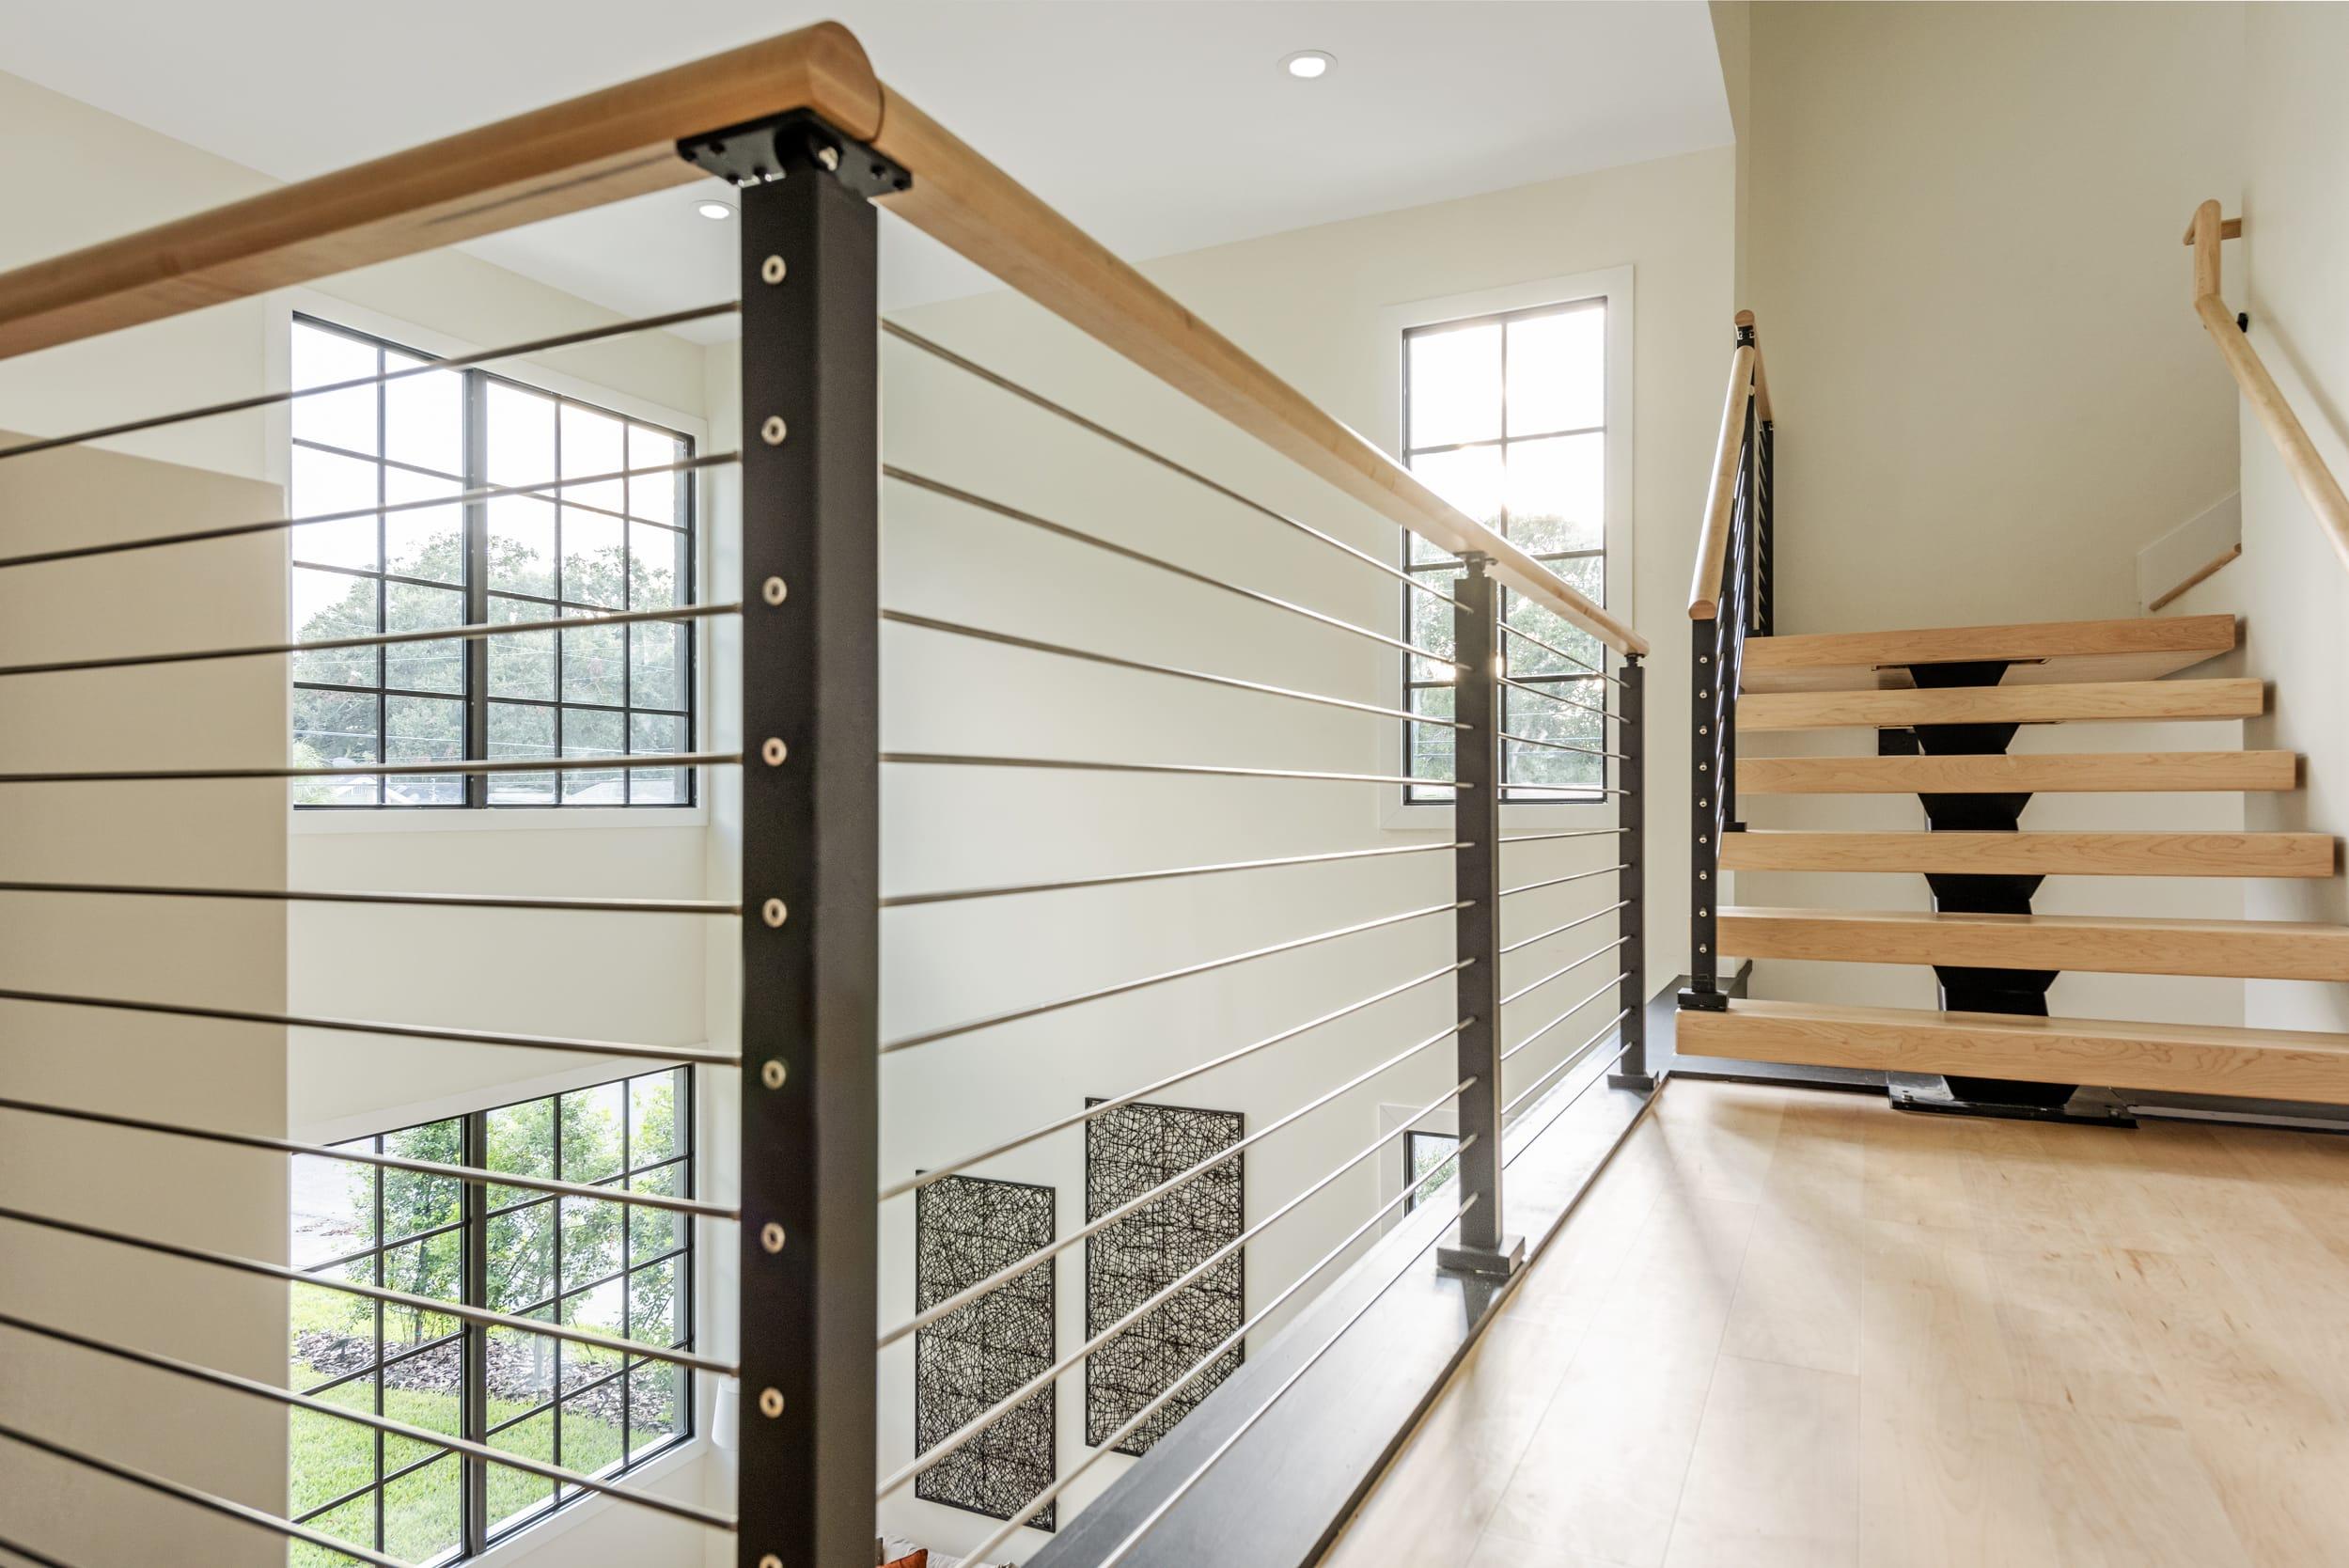 White Contemporary Cable Deck Railing Star Landing Farmhouse Windows Angle